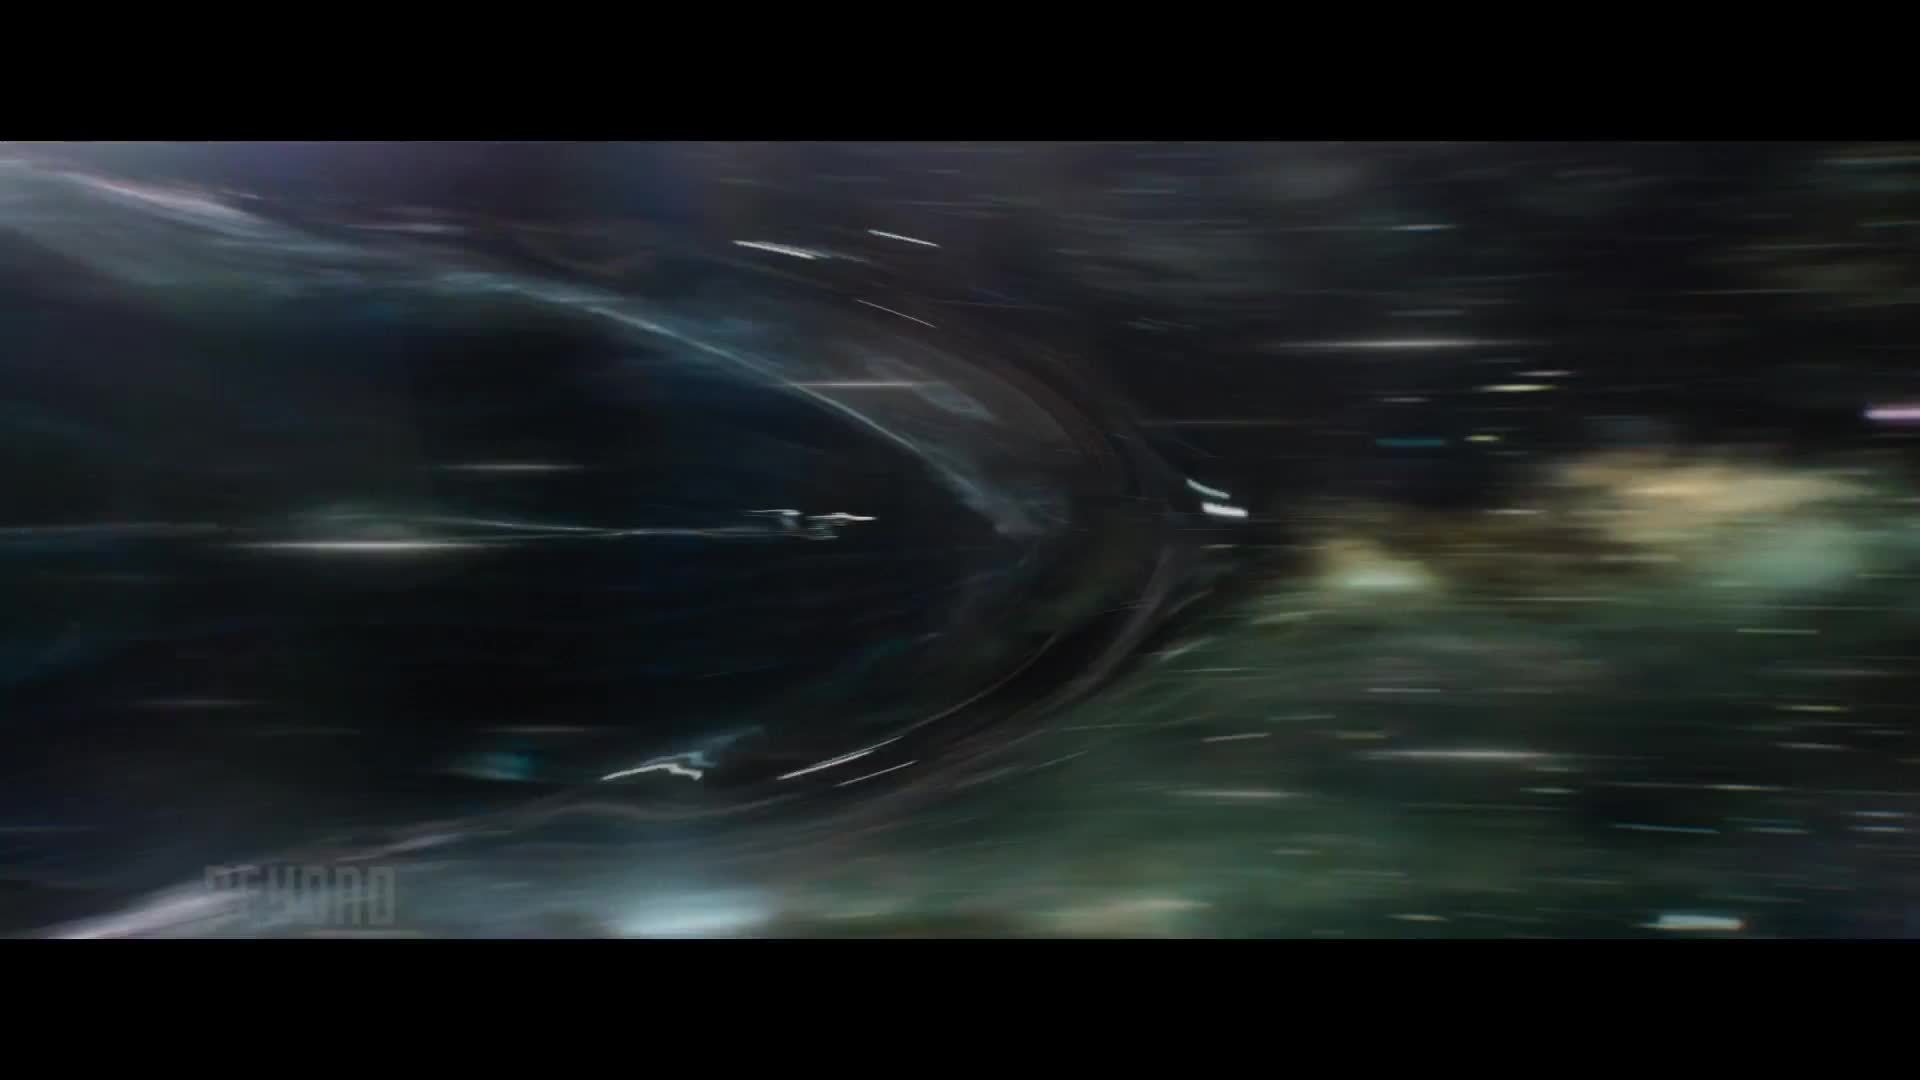 Warp Speed Wallpaper – WallpaperSafari